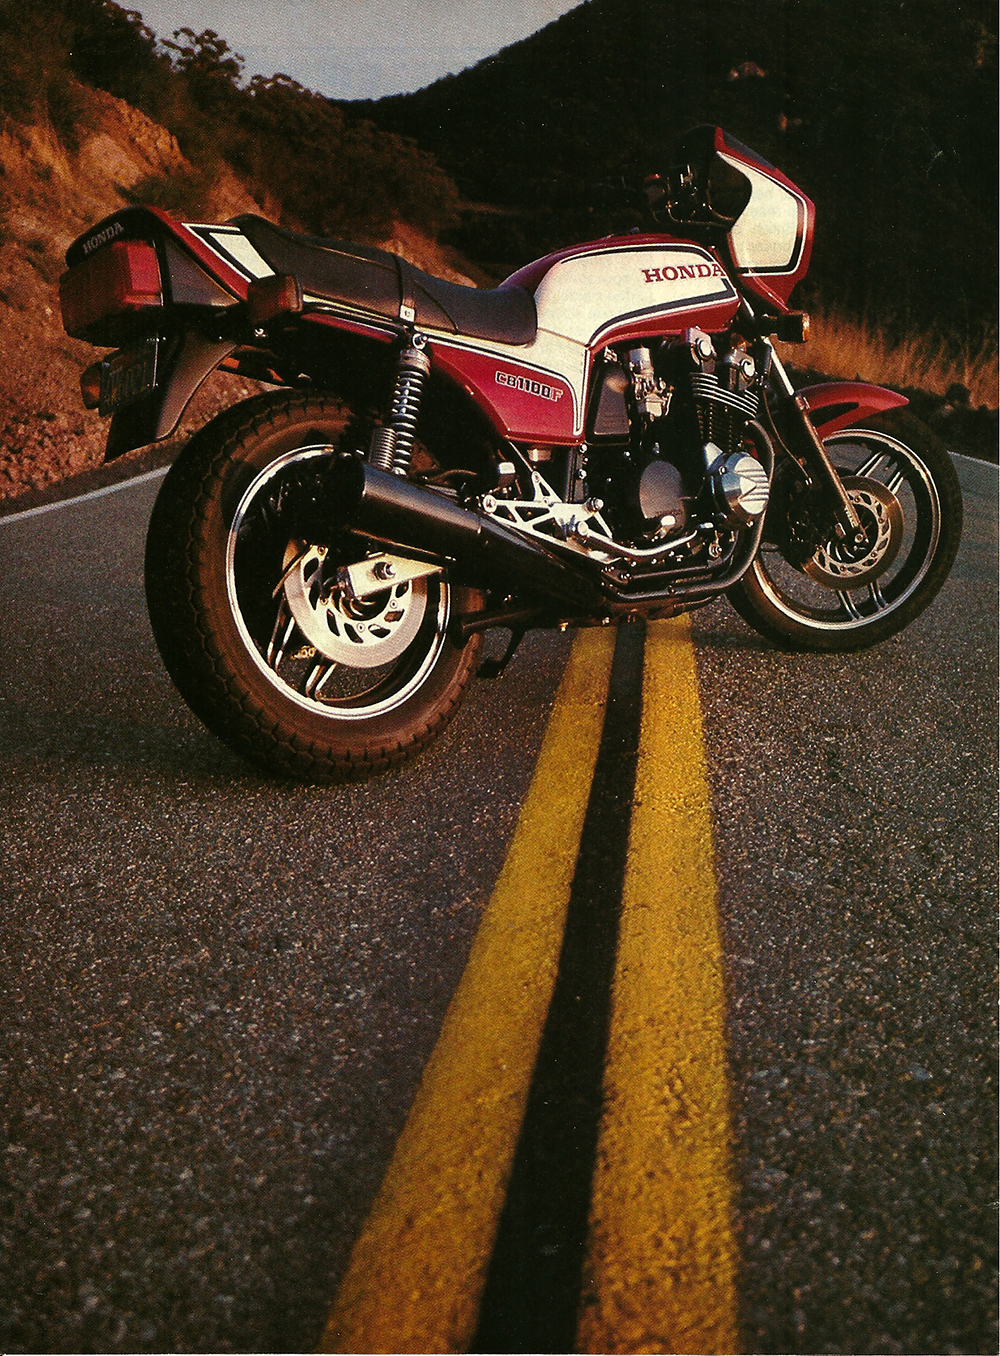 1983 Honda CB1100F road test 1.jpg